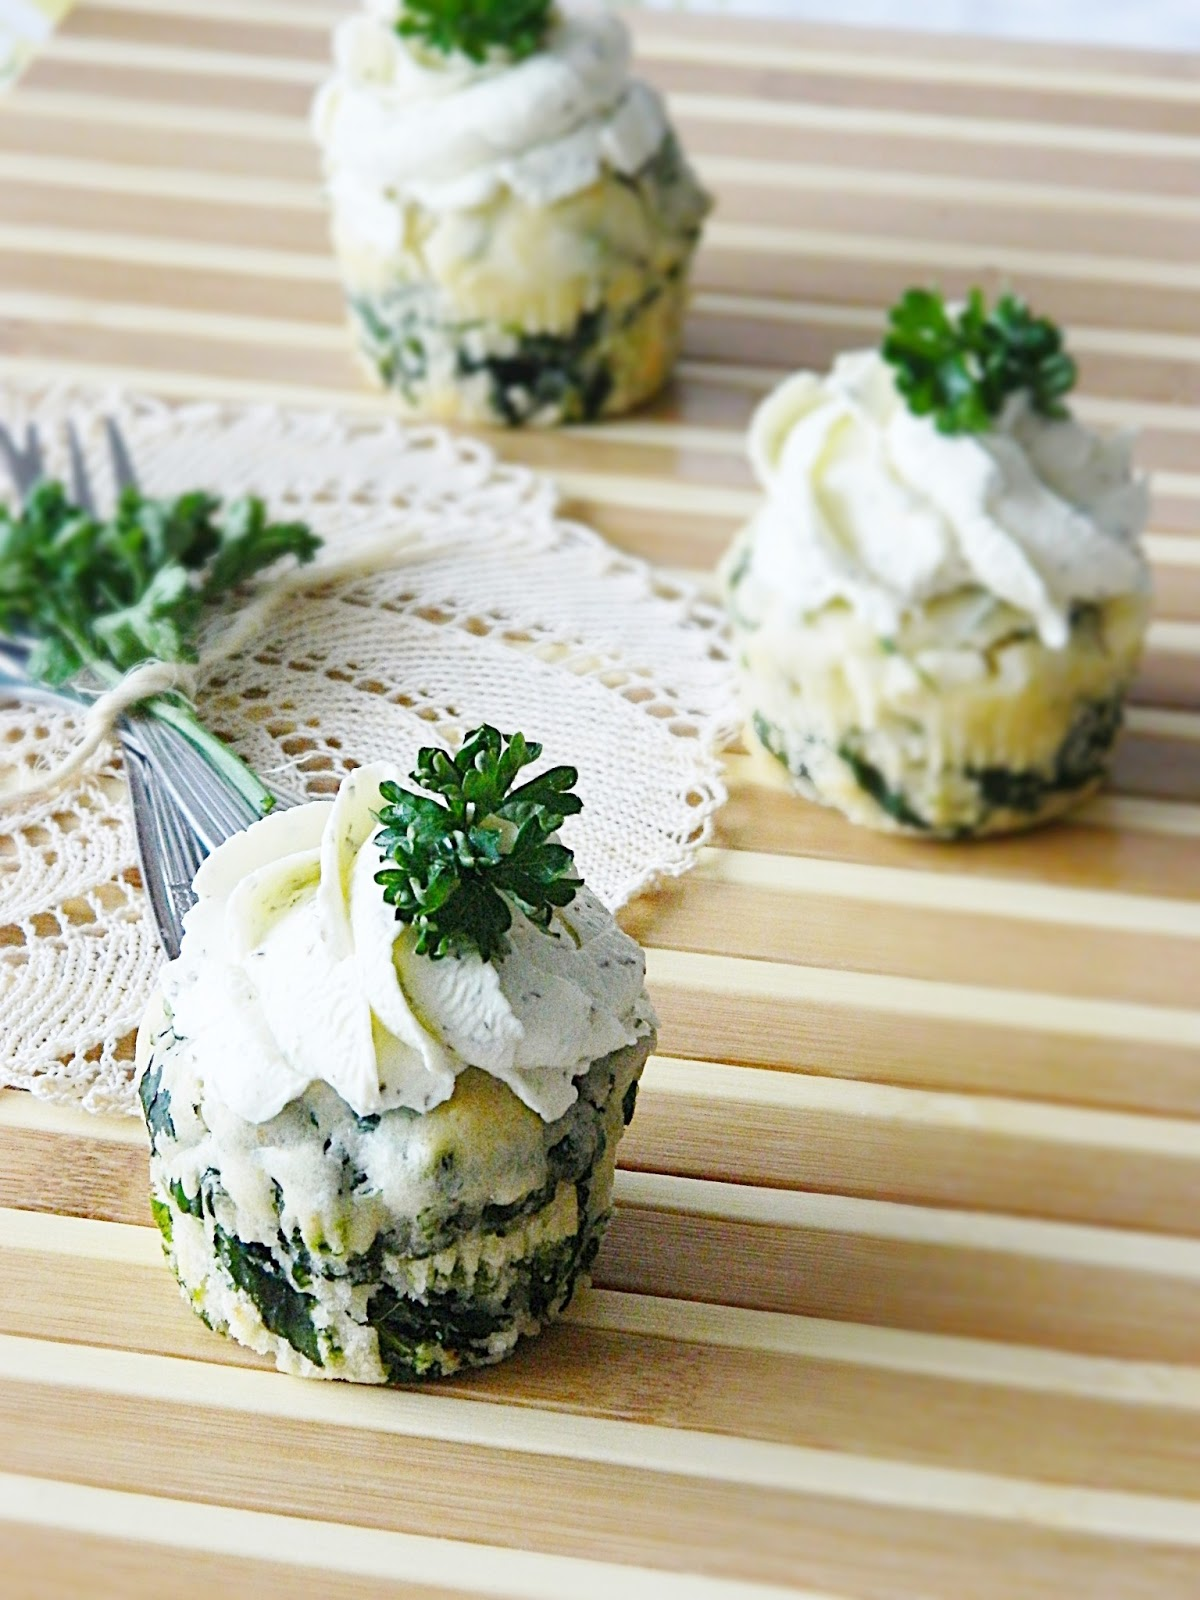 dr ola 39 s kitchen spinach feta muffins spinat feta muffins. Black Bedroom Furniture Sets. Home Design Ideas